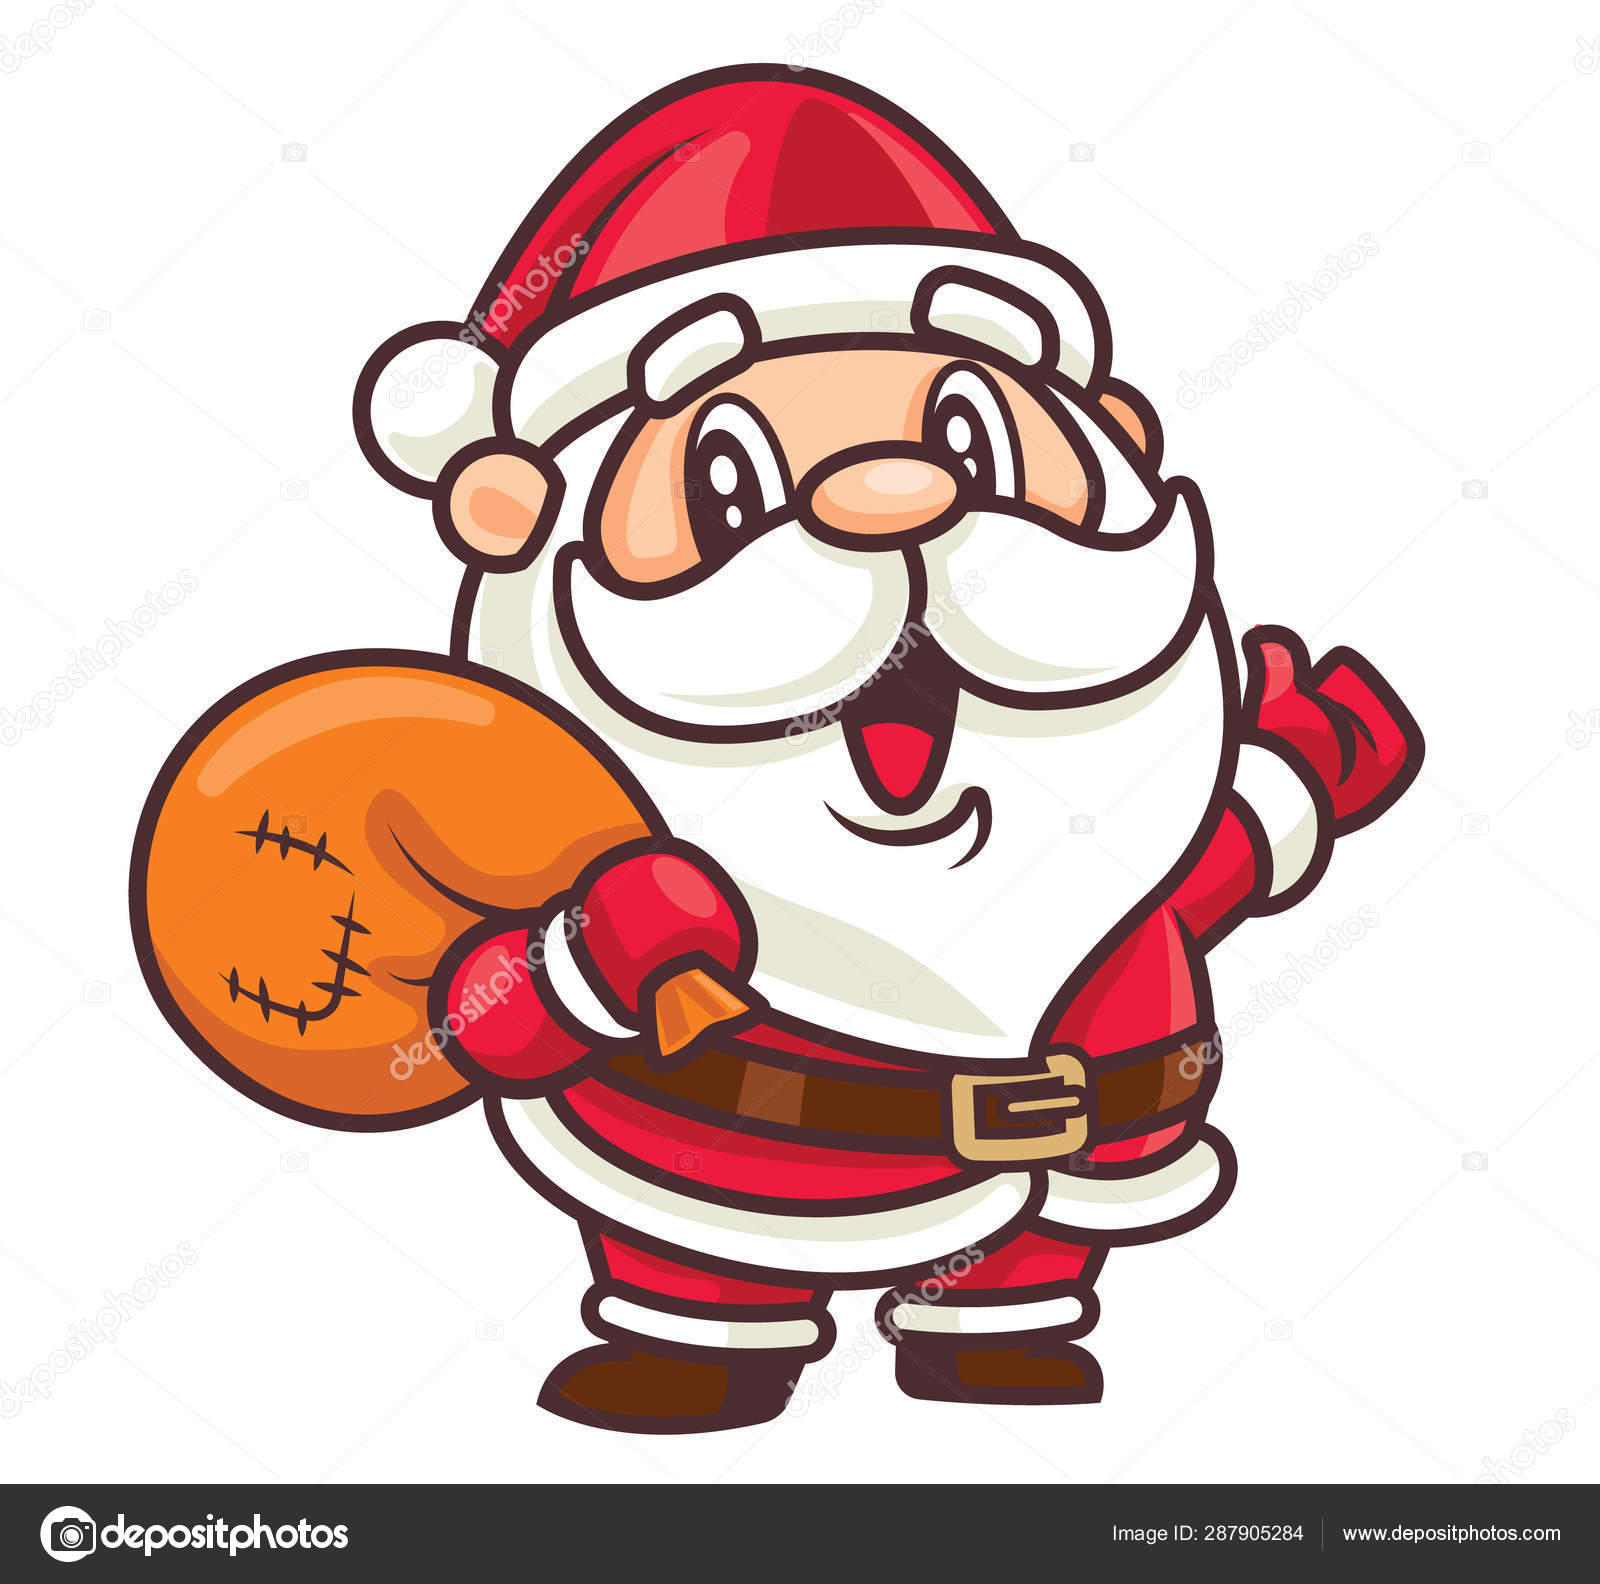 merry christmas cartoon cute santa claus mascot carrying christmas gift stock vector c charactoon 287905284 merry christmas cartoon cute santa claus mascot carrying christmas gift stock vector c charactoon 287905284